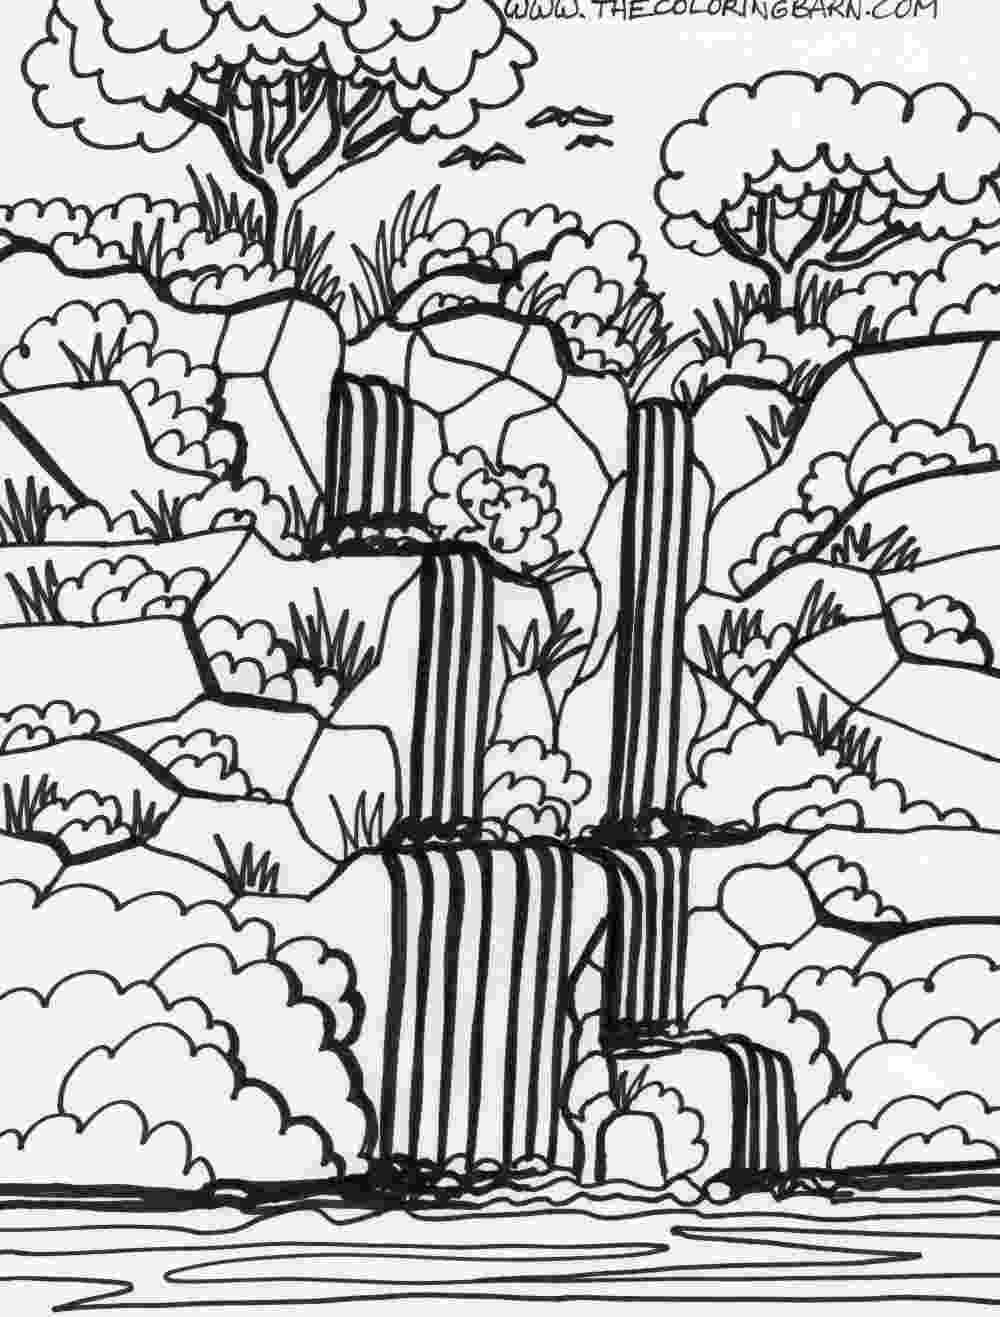 waterfall coloring page waterfall beautiful coloring page free coloring pages online coloring waterfall page